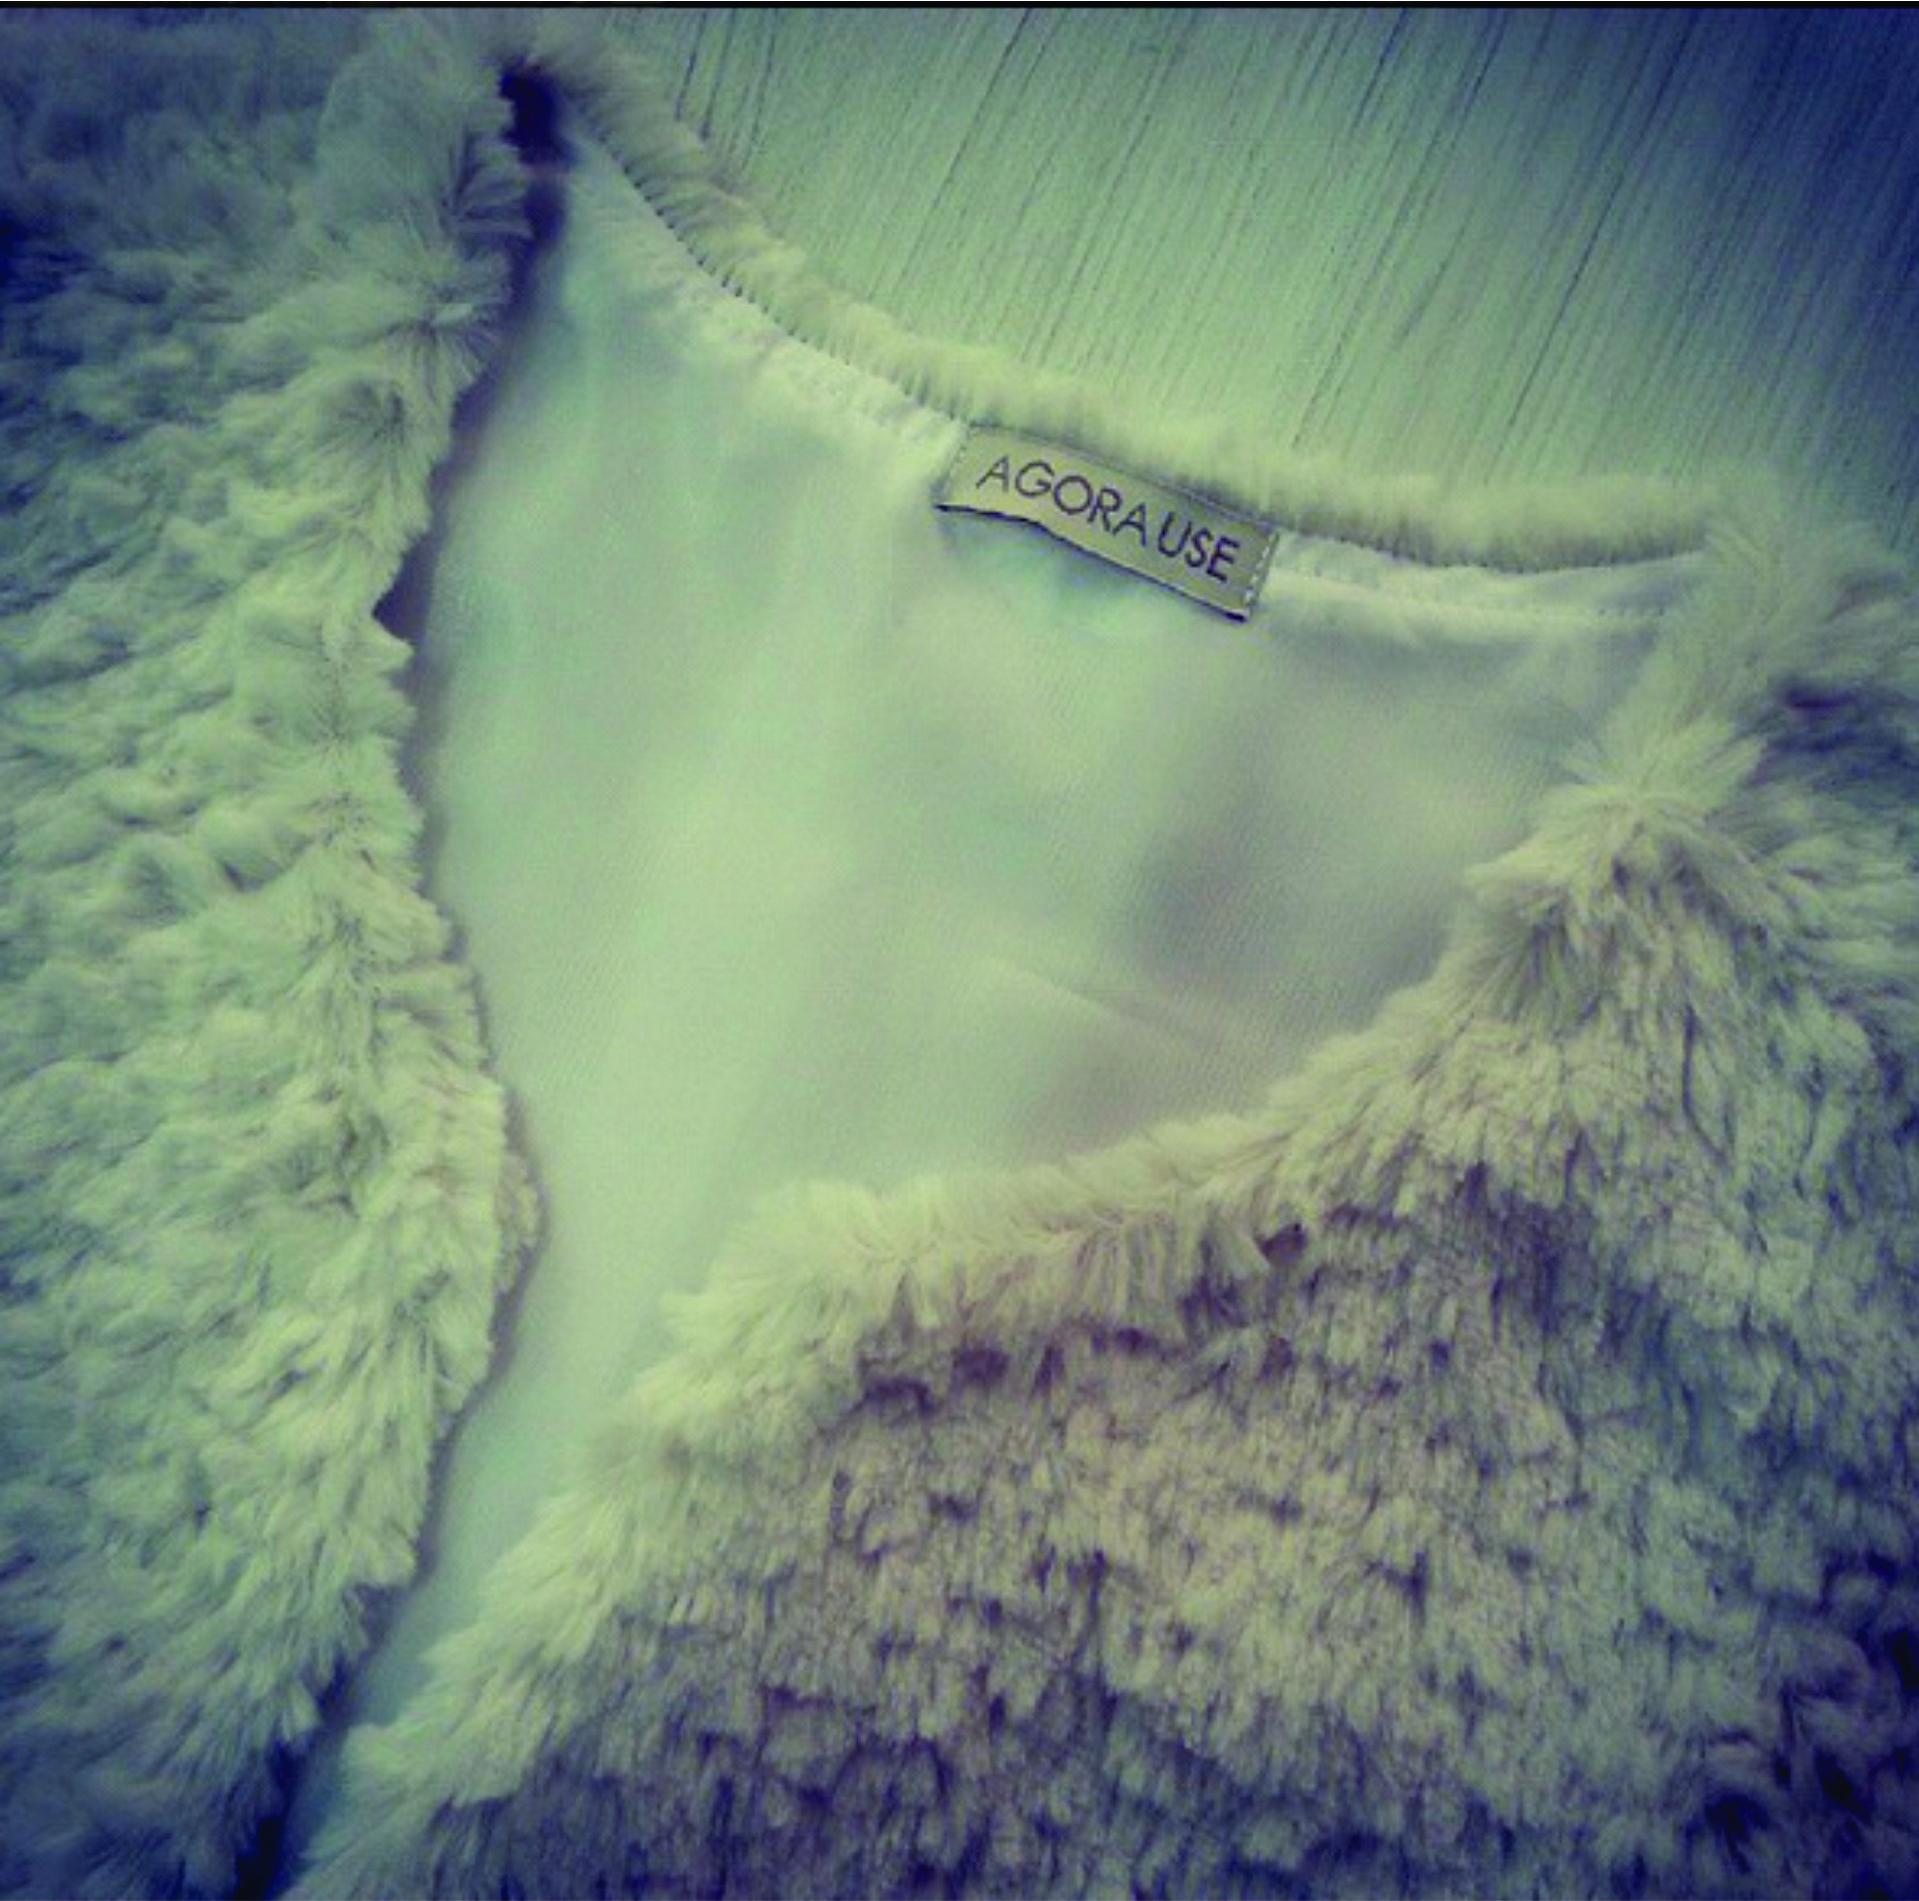 Colete Pele Off White <3